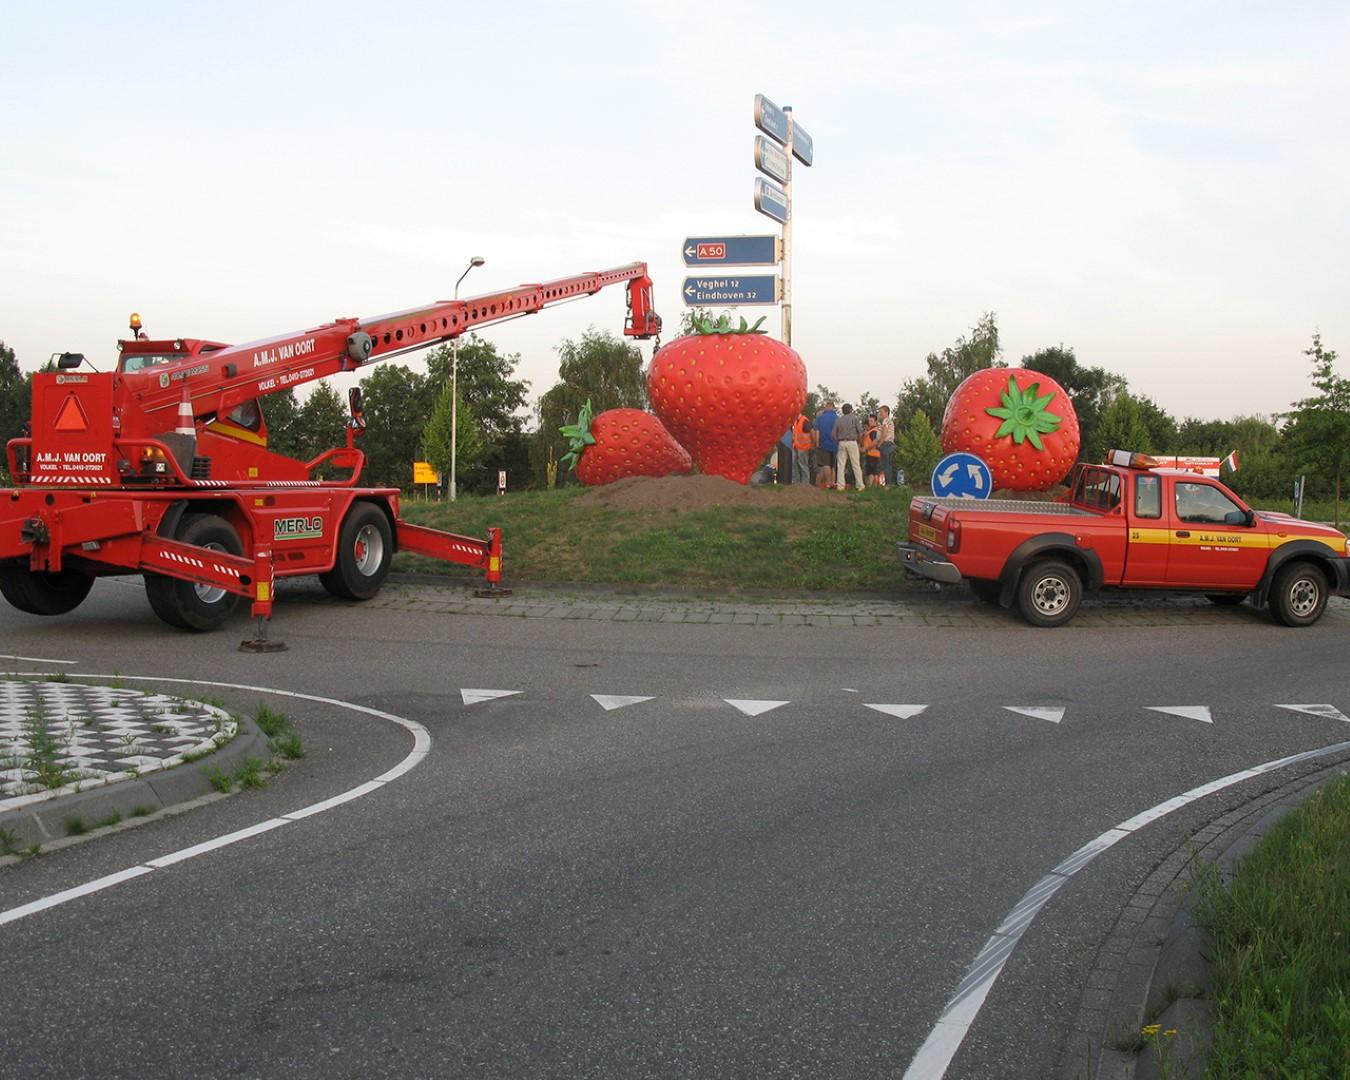 Rotonde Aardbeien van Jan en Birgitte